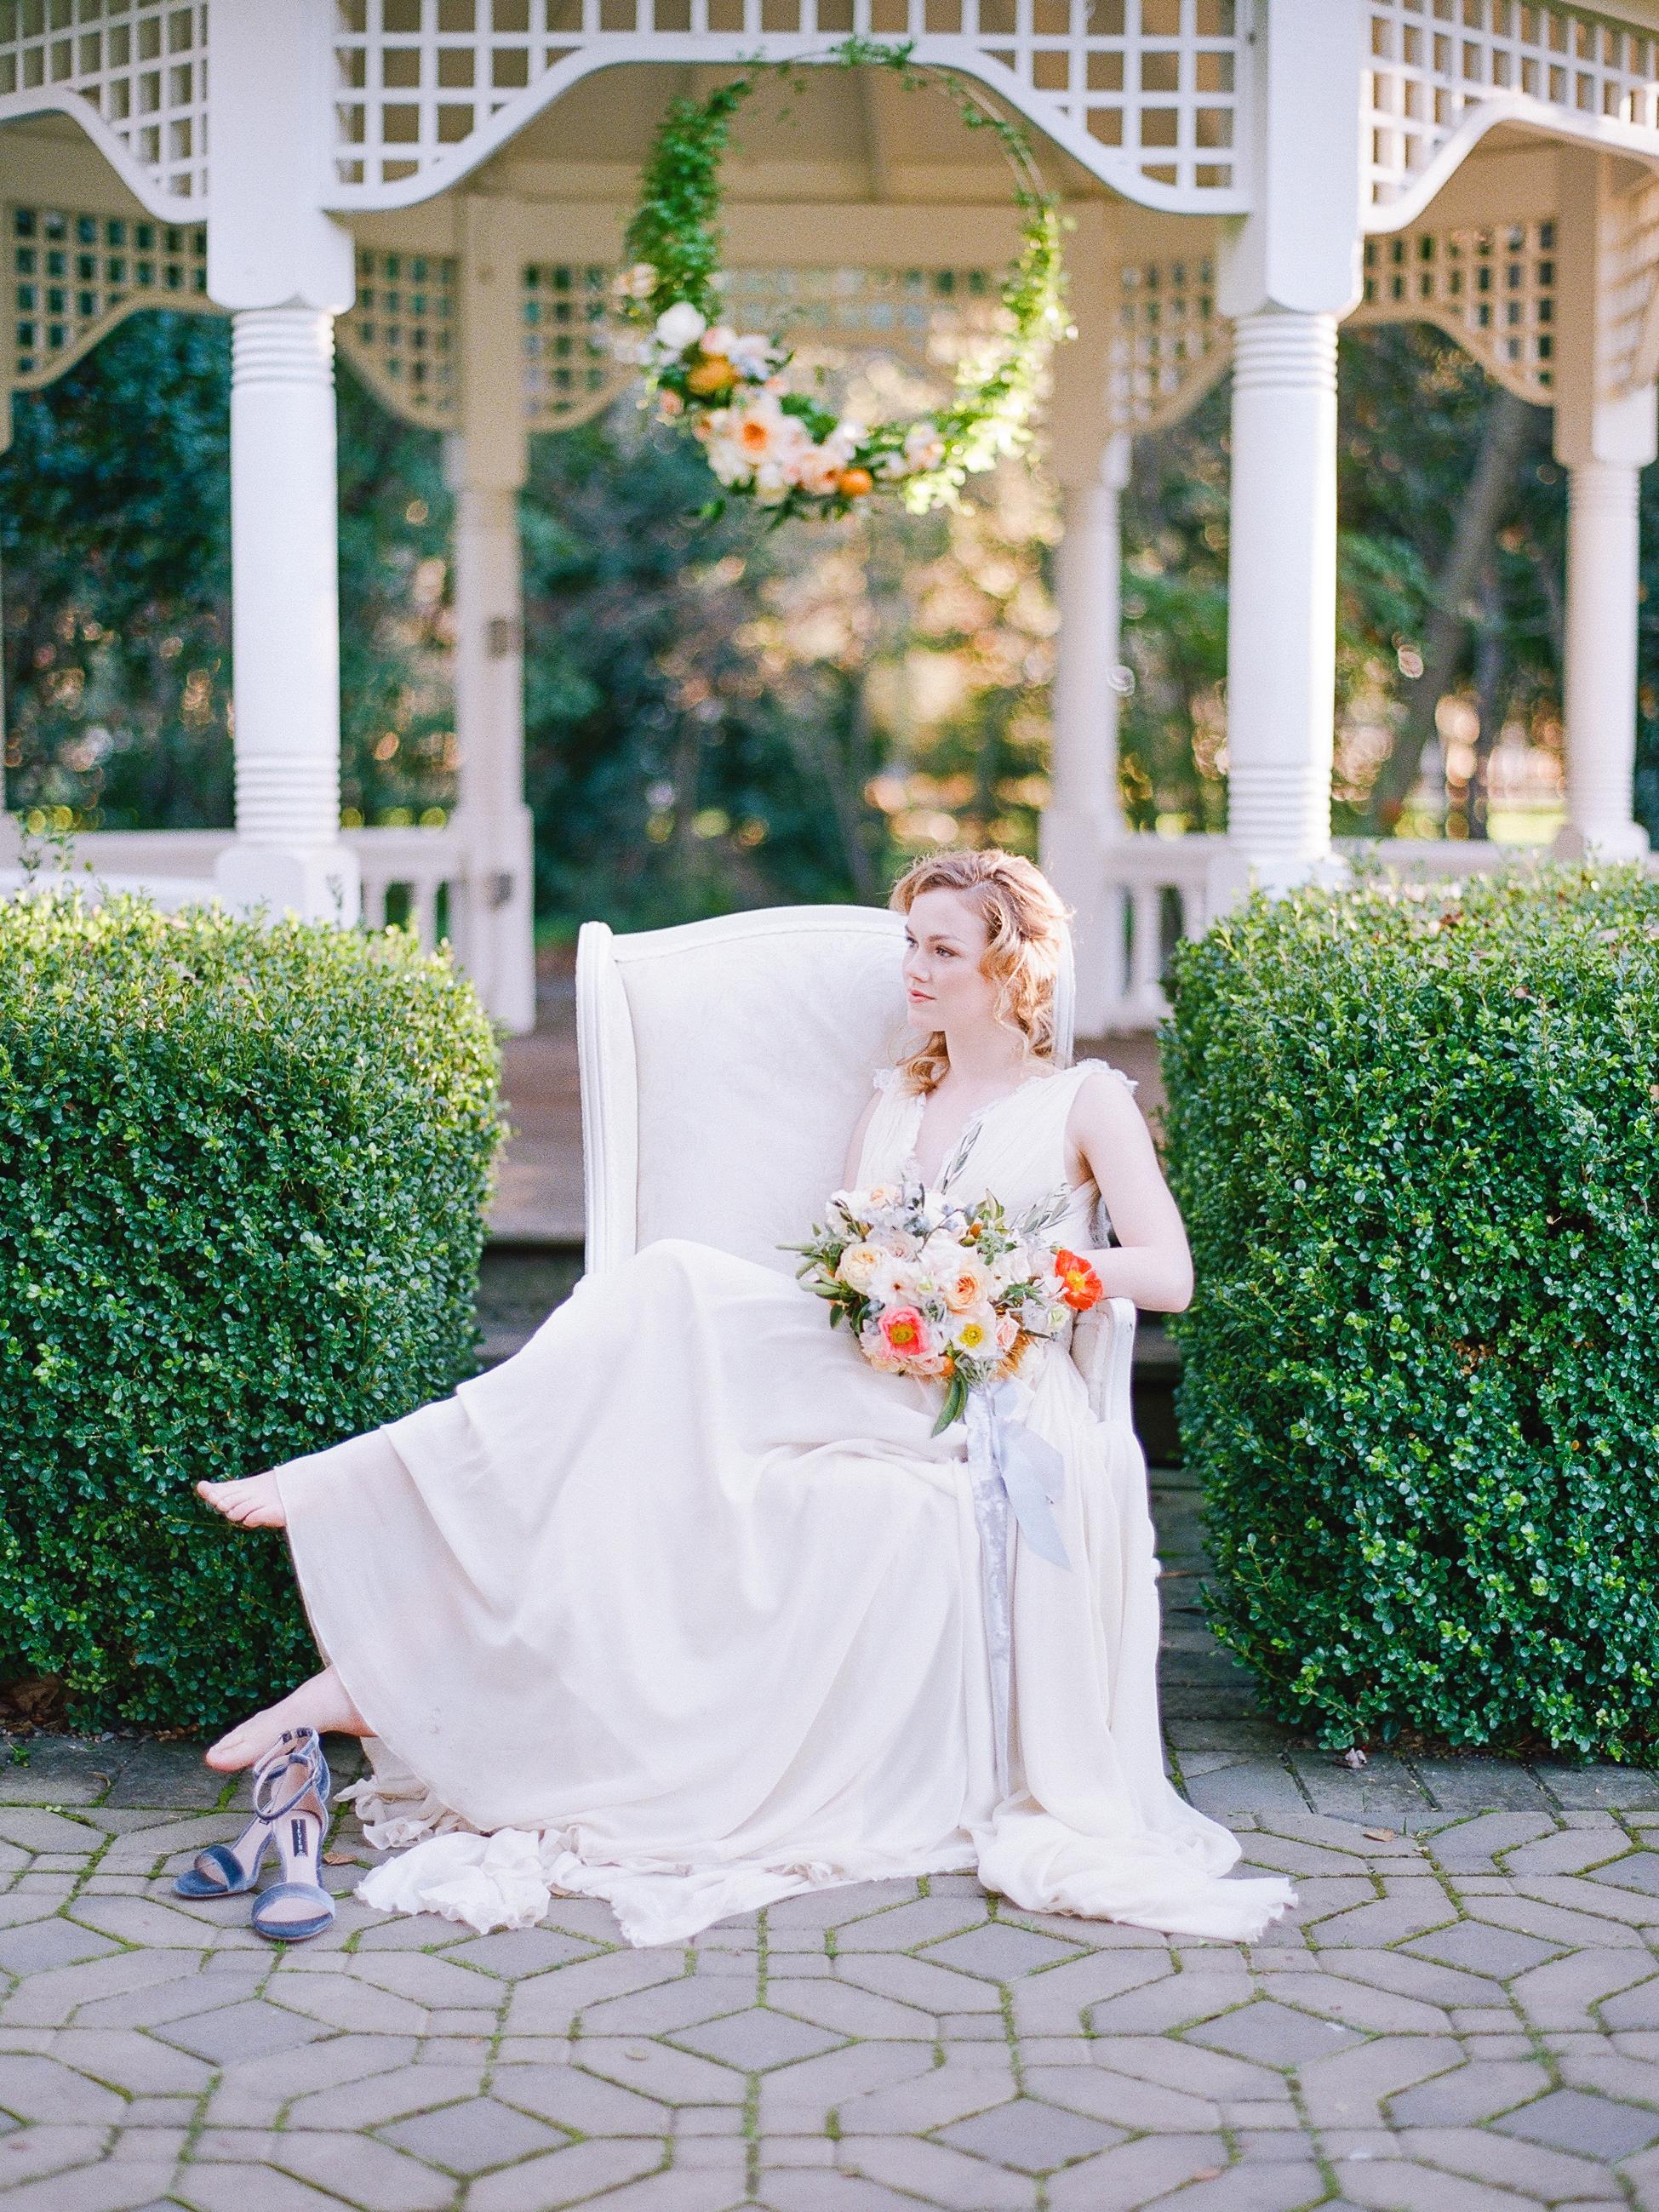 radostina-boseva-bride-to-be-ardenwood